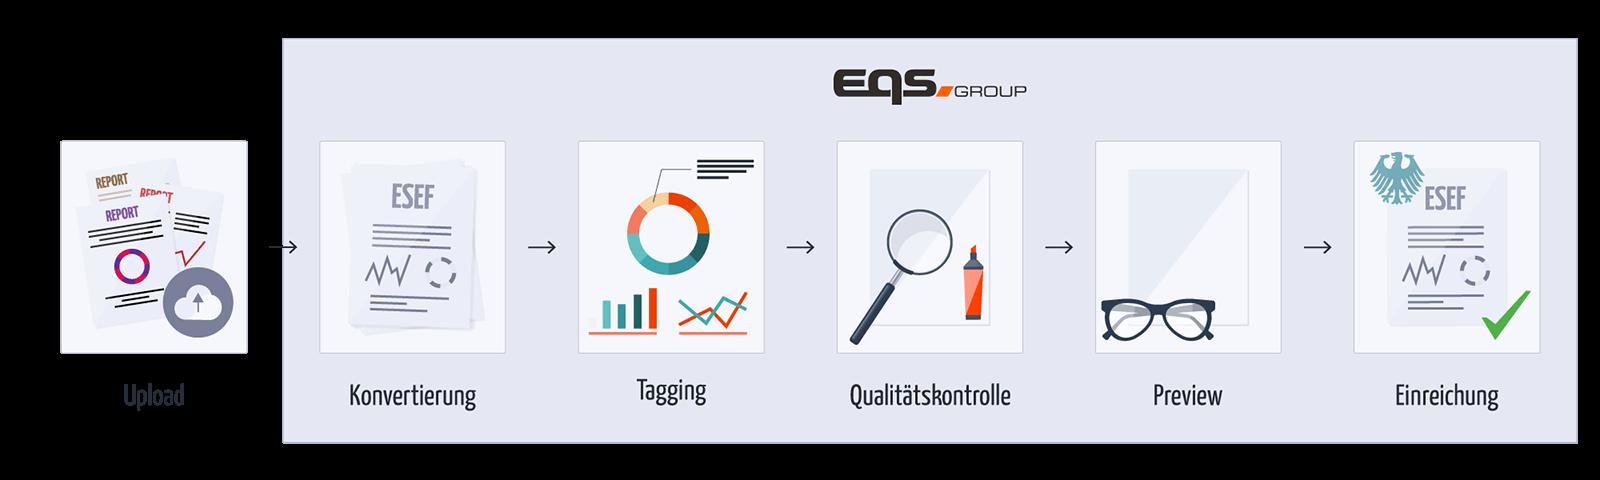 ESEF-Service Workflow | EQS Group